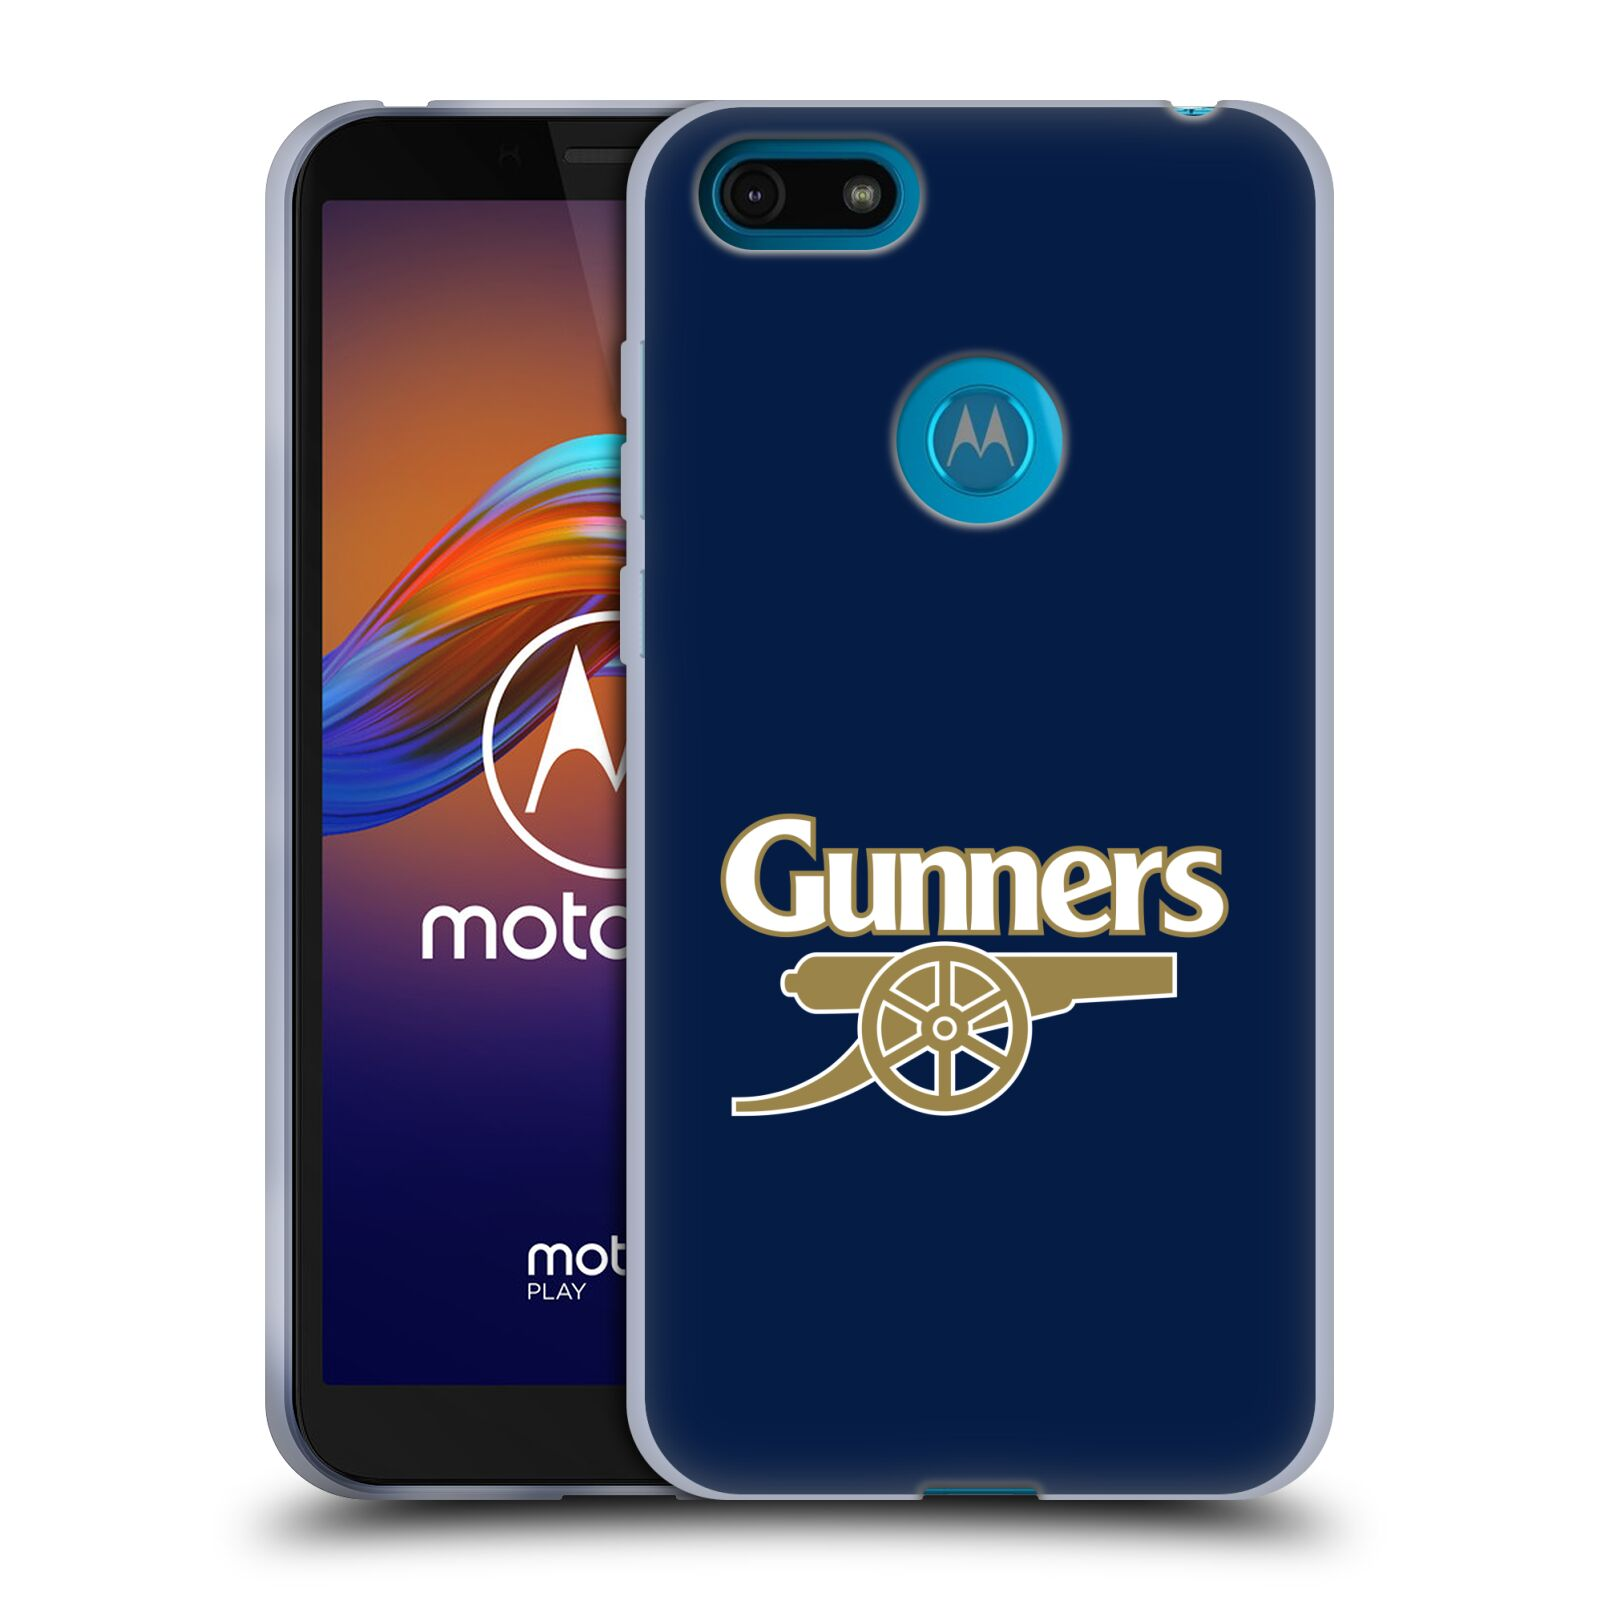 Silikonové pouzdro na mobil Motorola Moto E6 Play - Head Case - Arsenal FC - Gunners